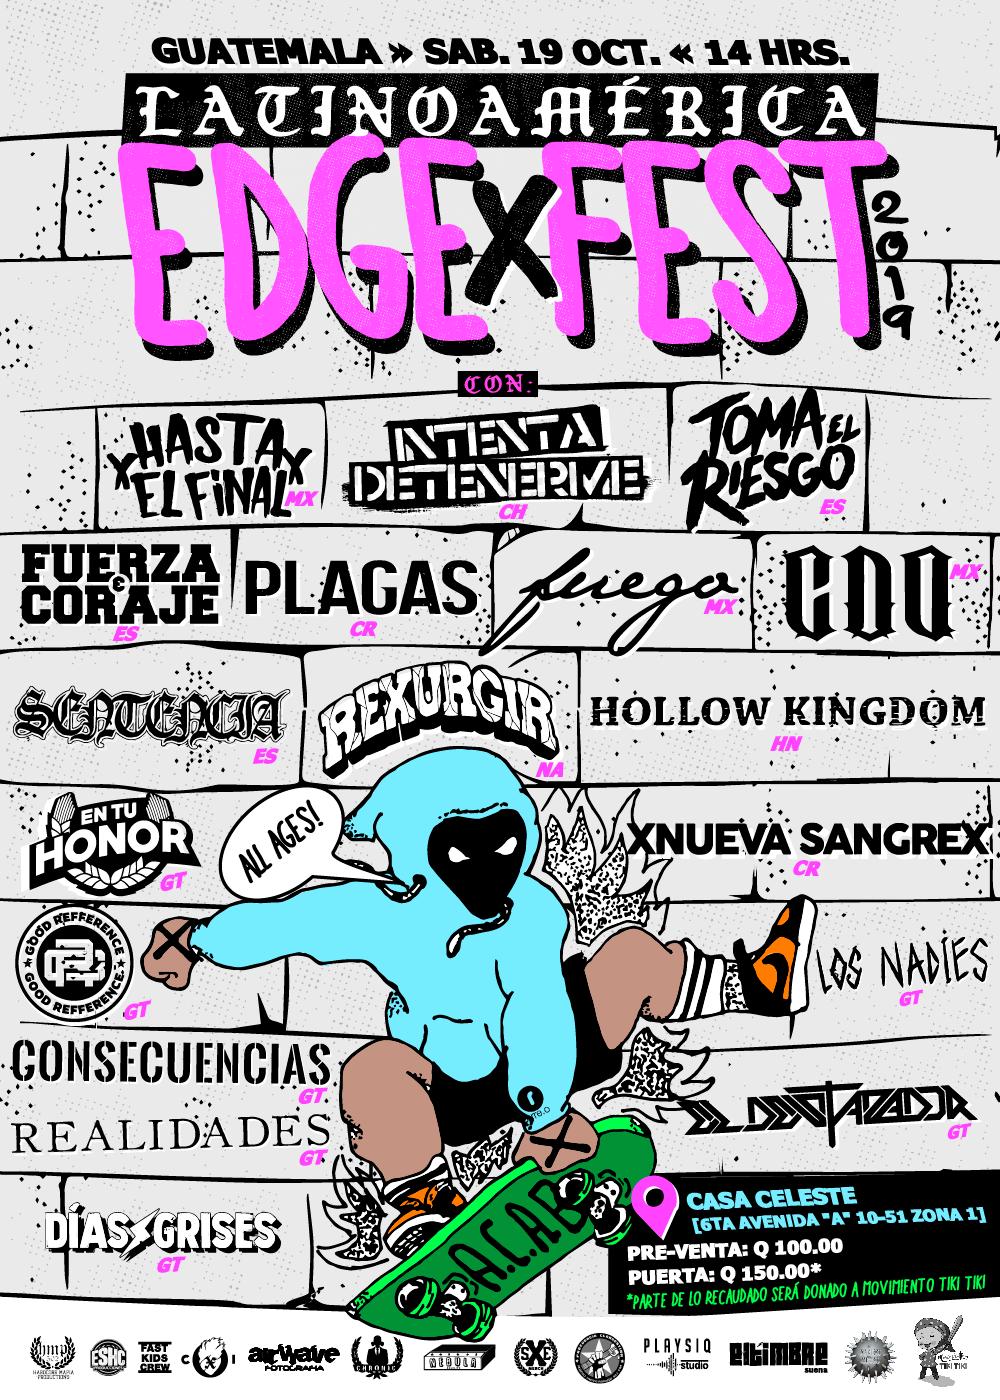 (Foto: Edge Fest Latinoamérica)